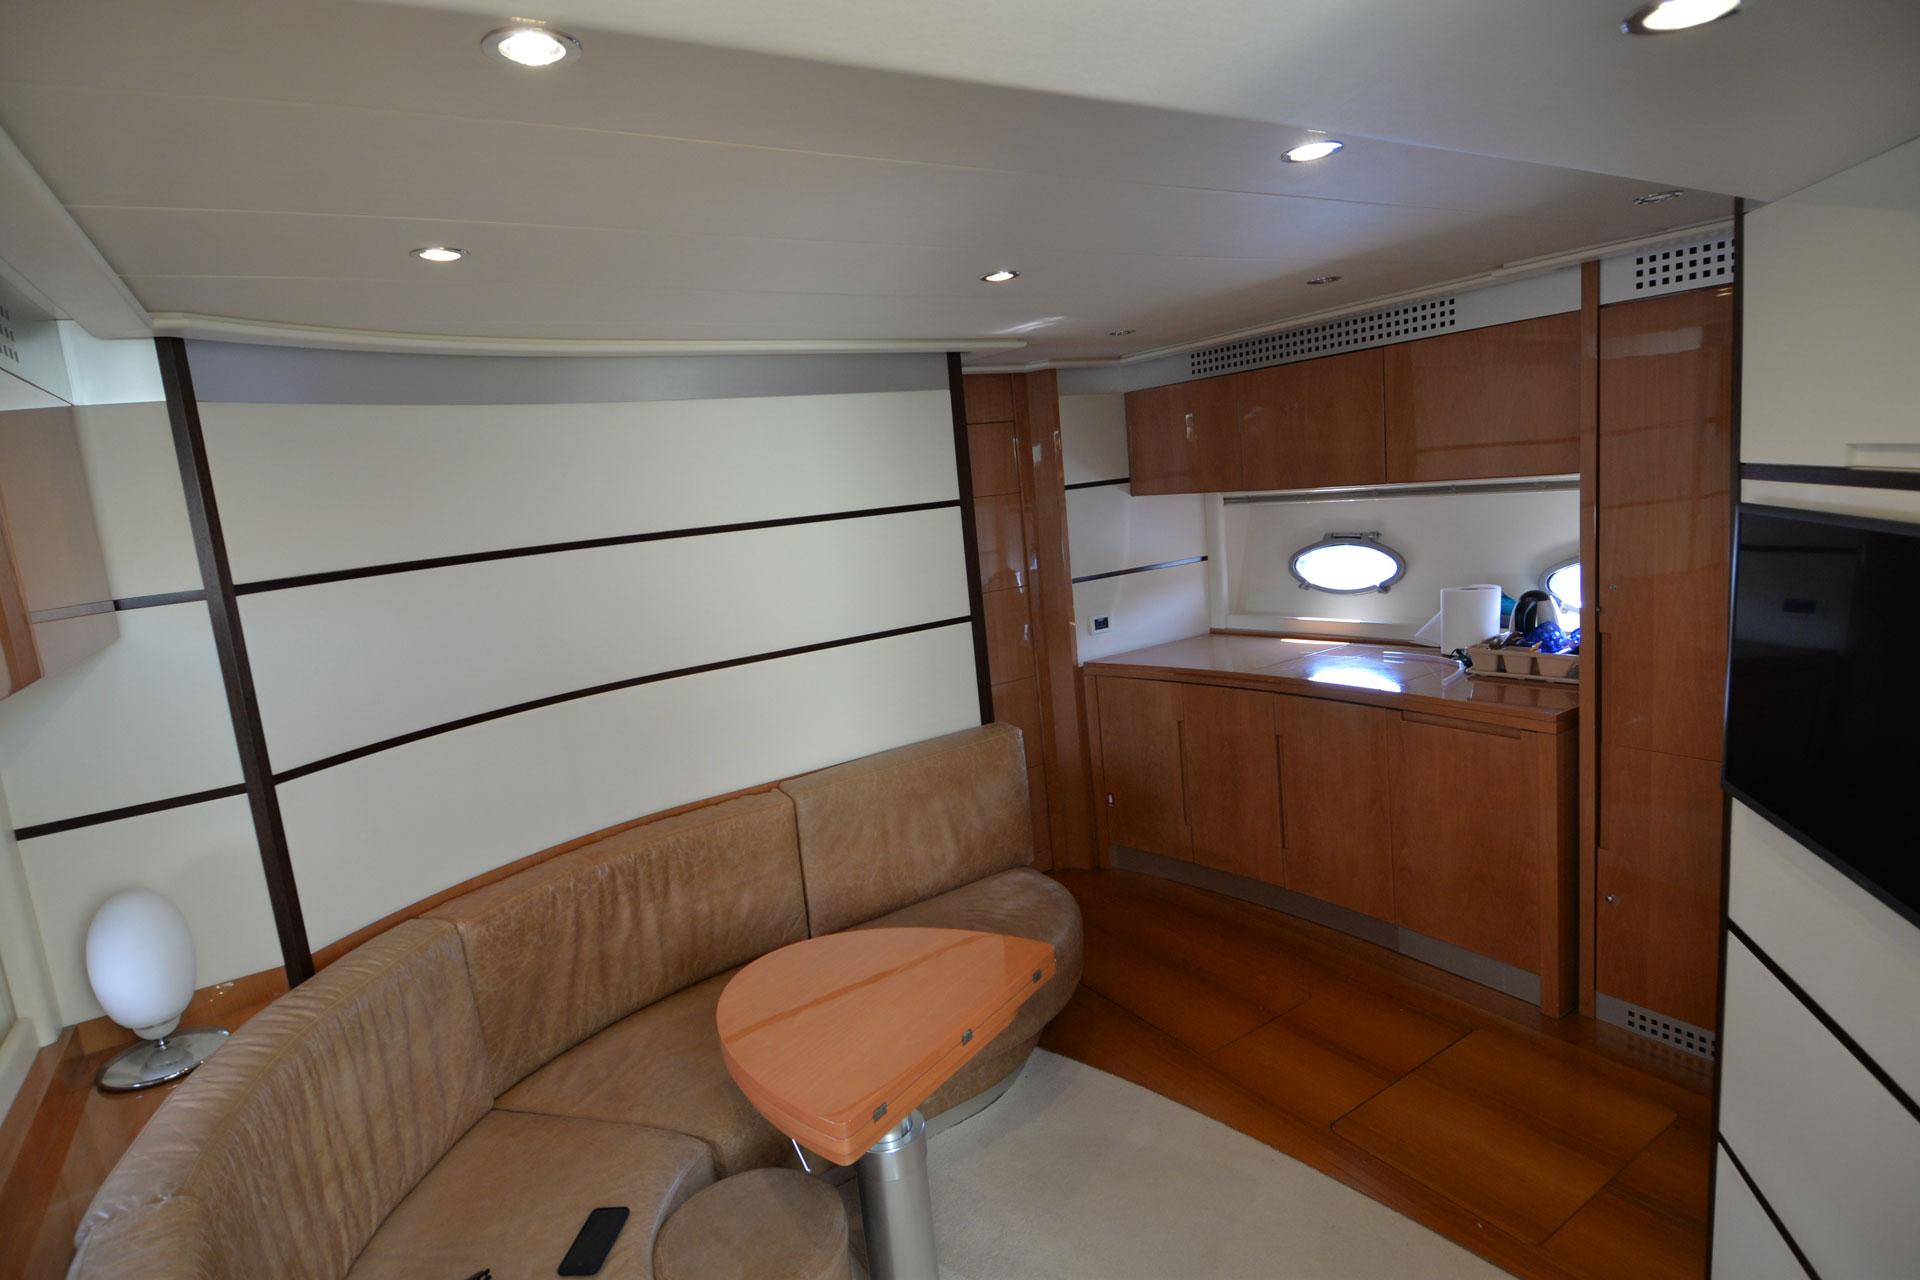 Santo-Maritime-Yachting-Pershing-Inside-Image15